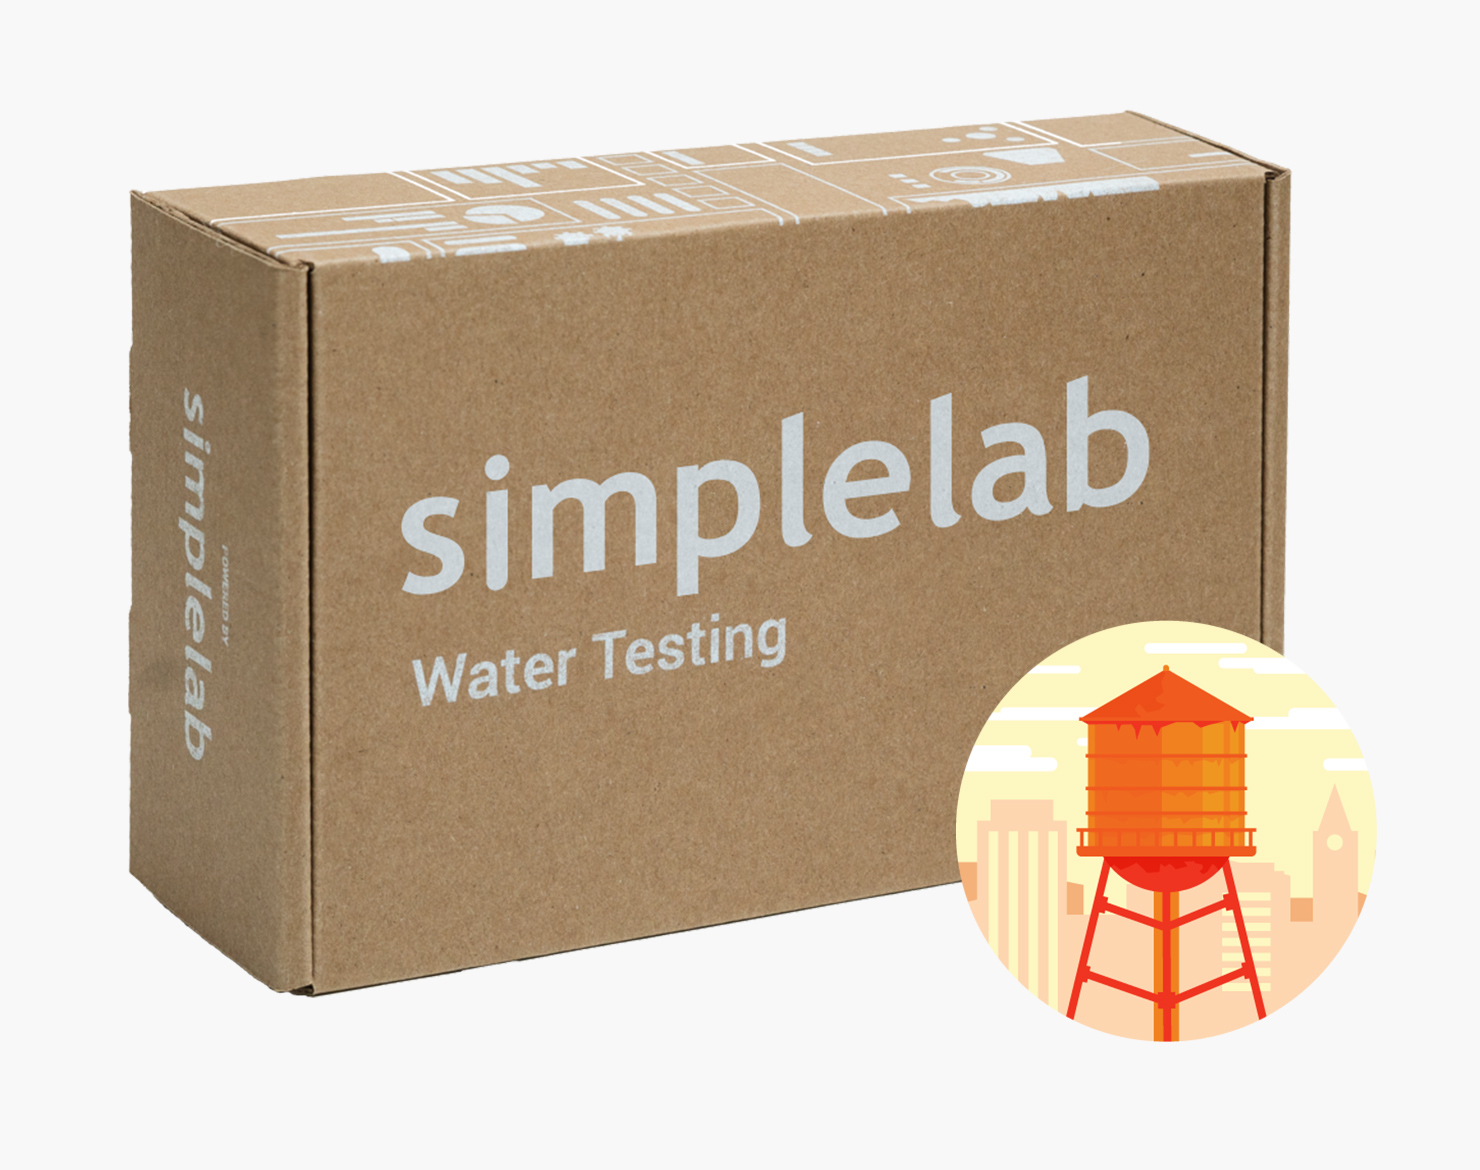 SimpleLab-Water-Test-Box-on-Blue-City